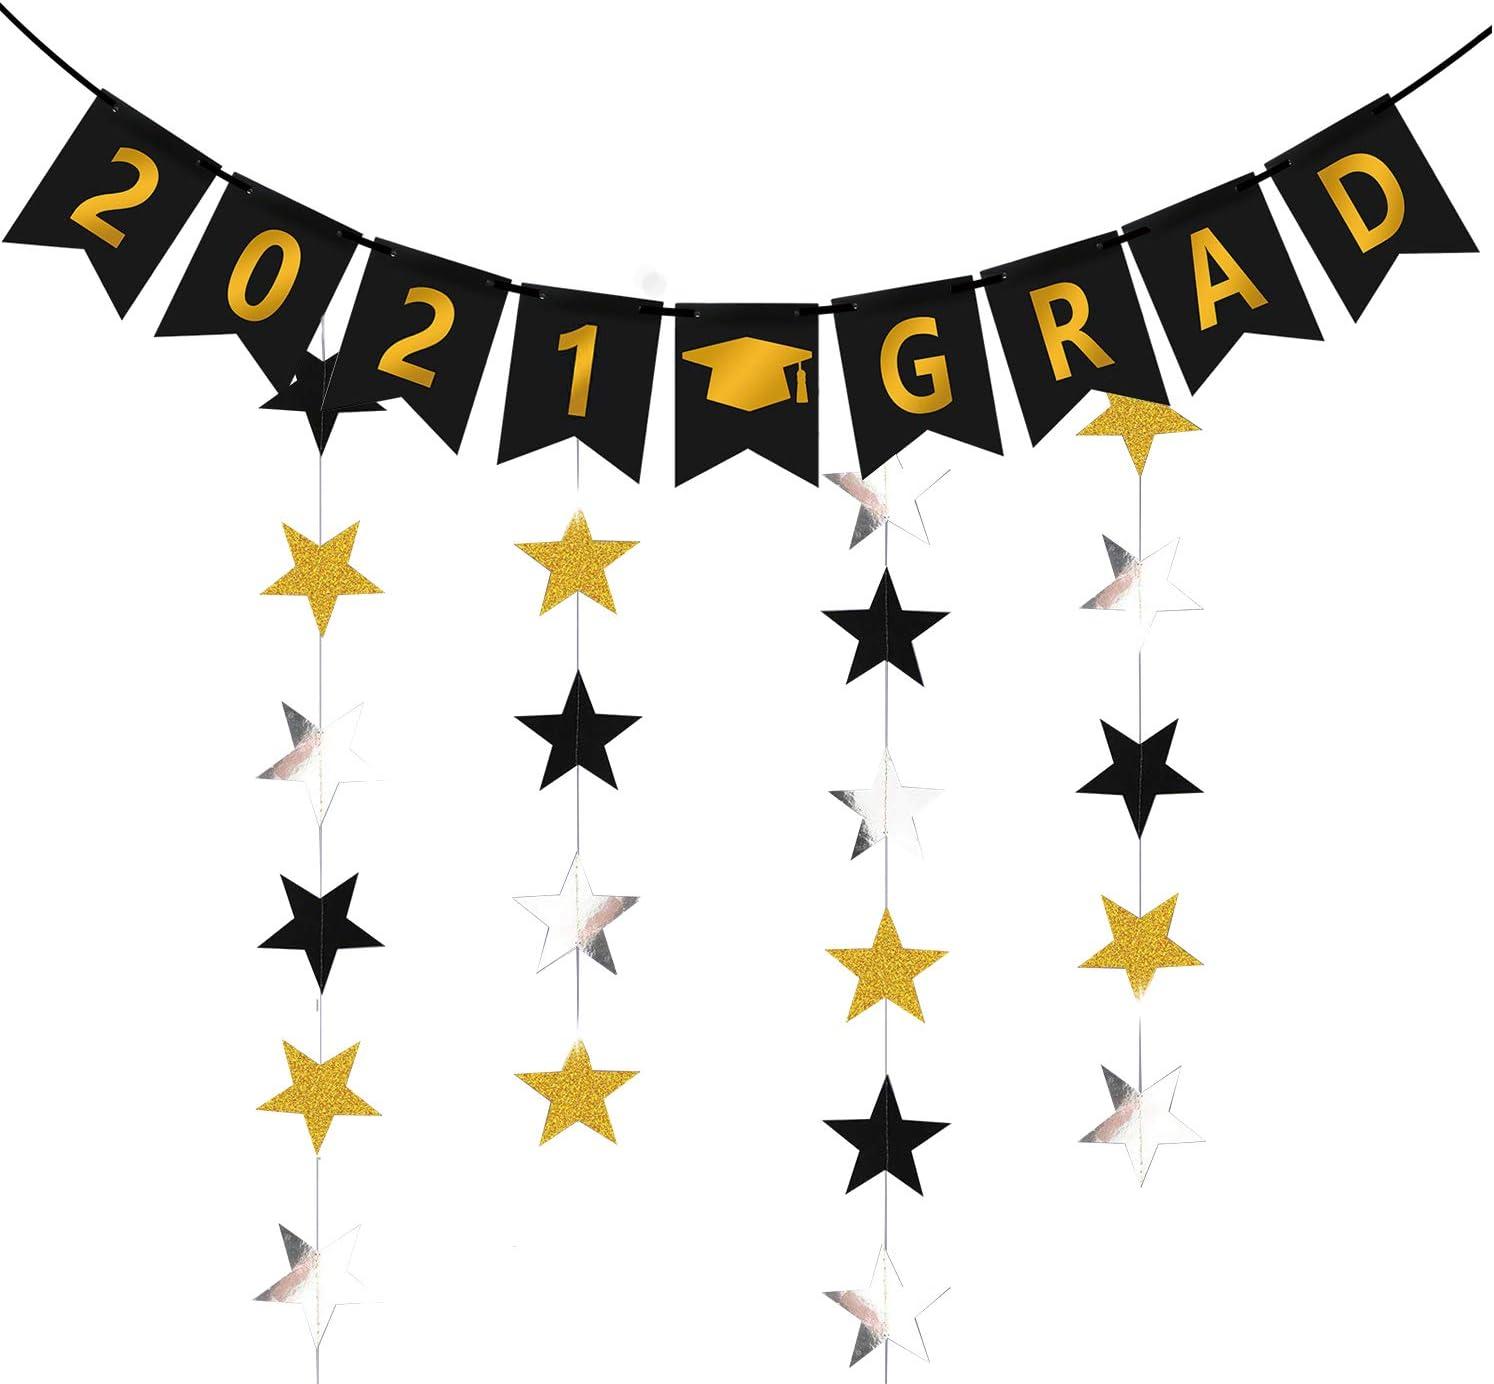 Black and Gold Graduation Graduation Party Decor 2019 Grad Banner Class of 2019 Graduation Banner Graduation Banner